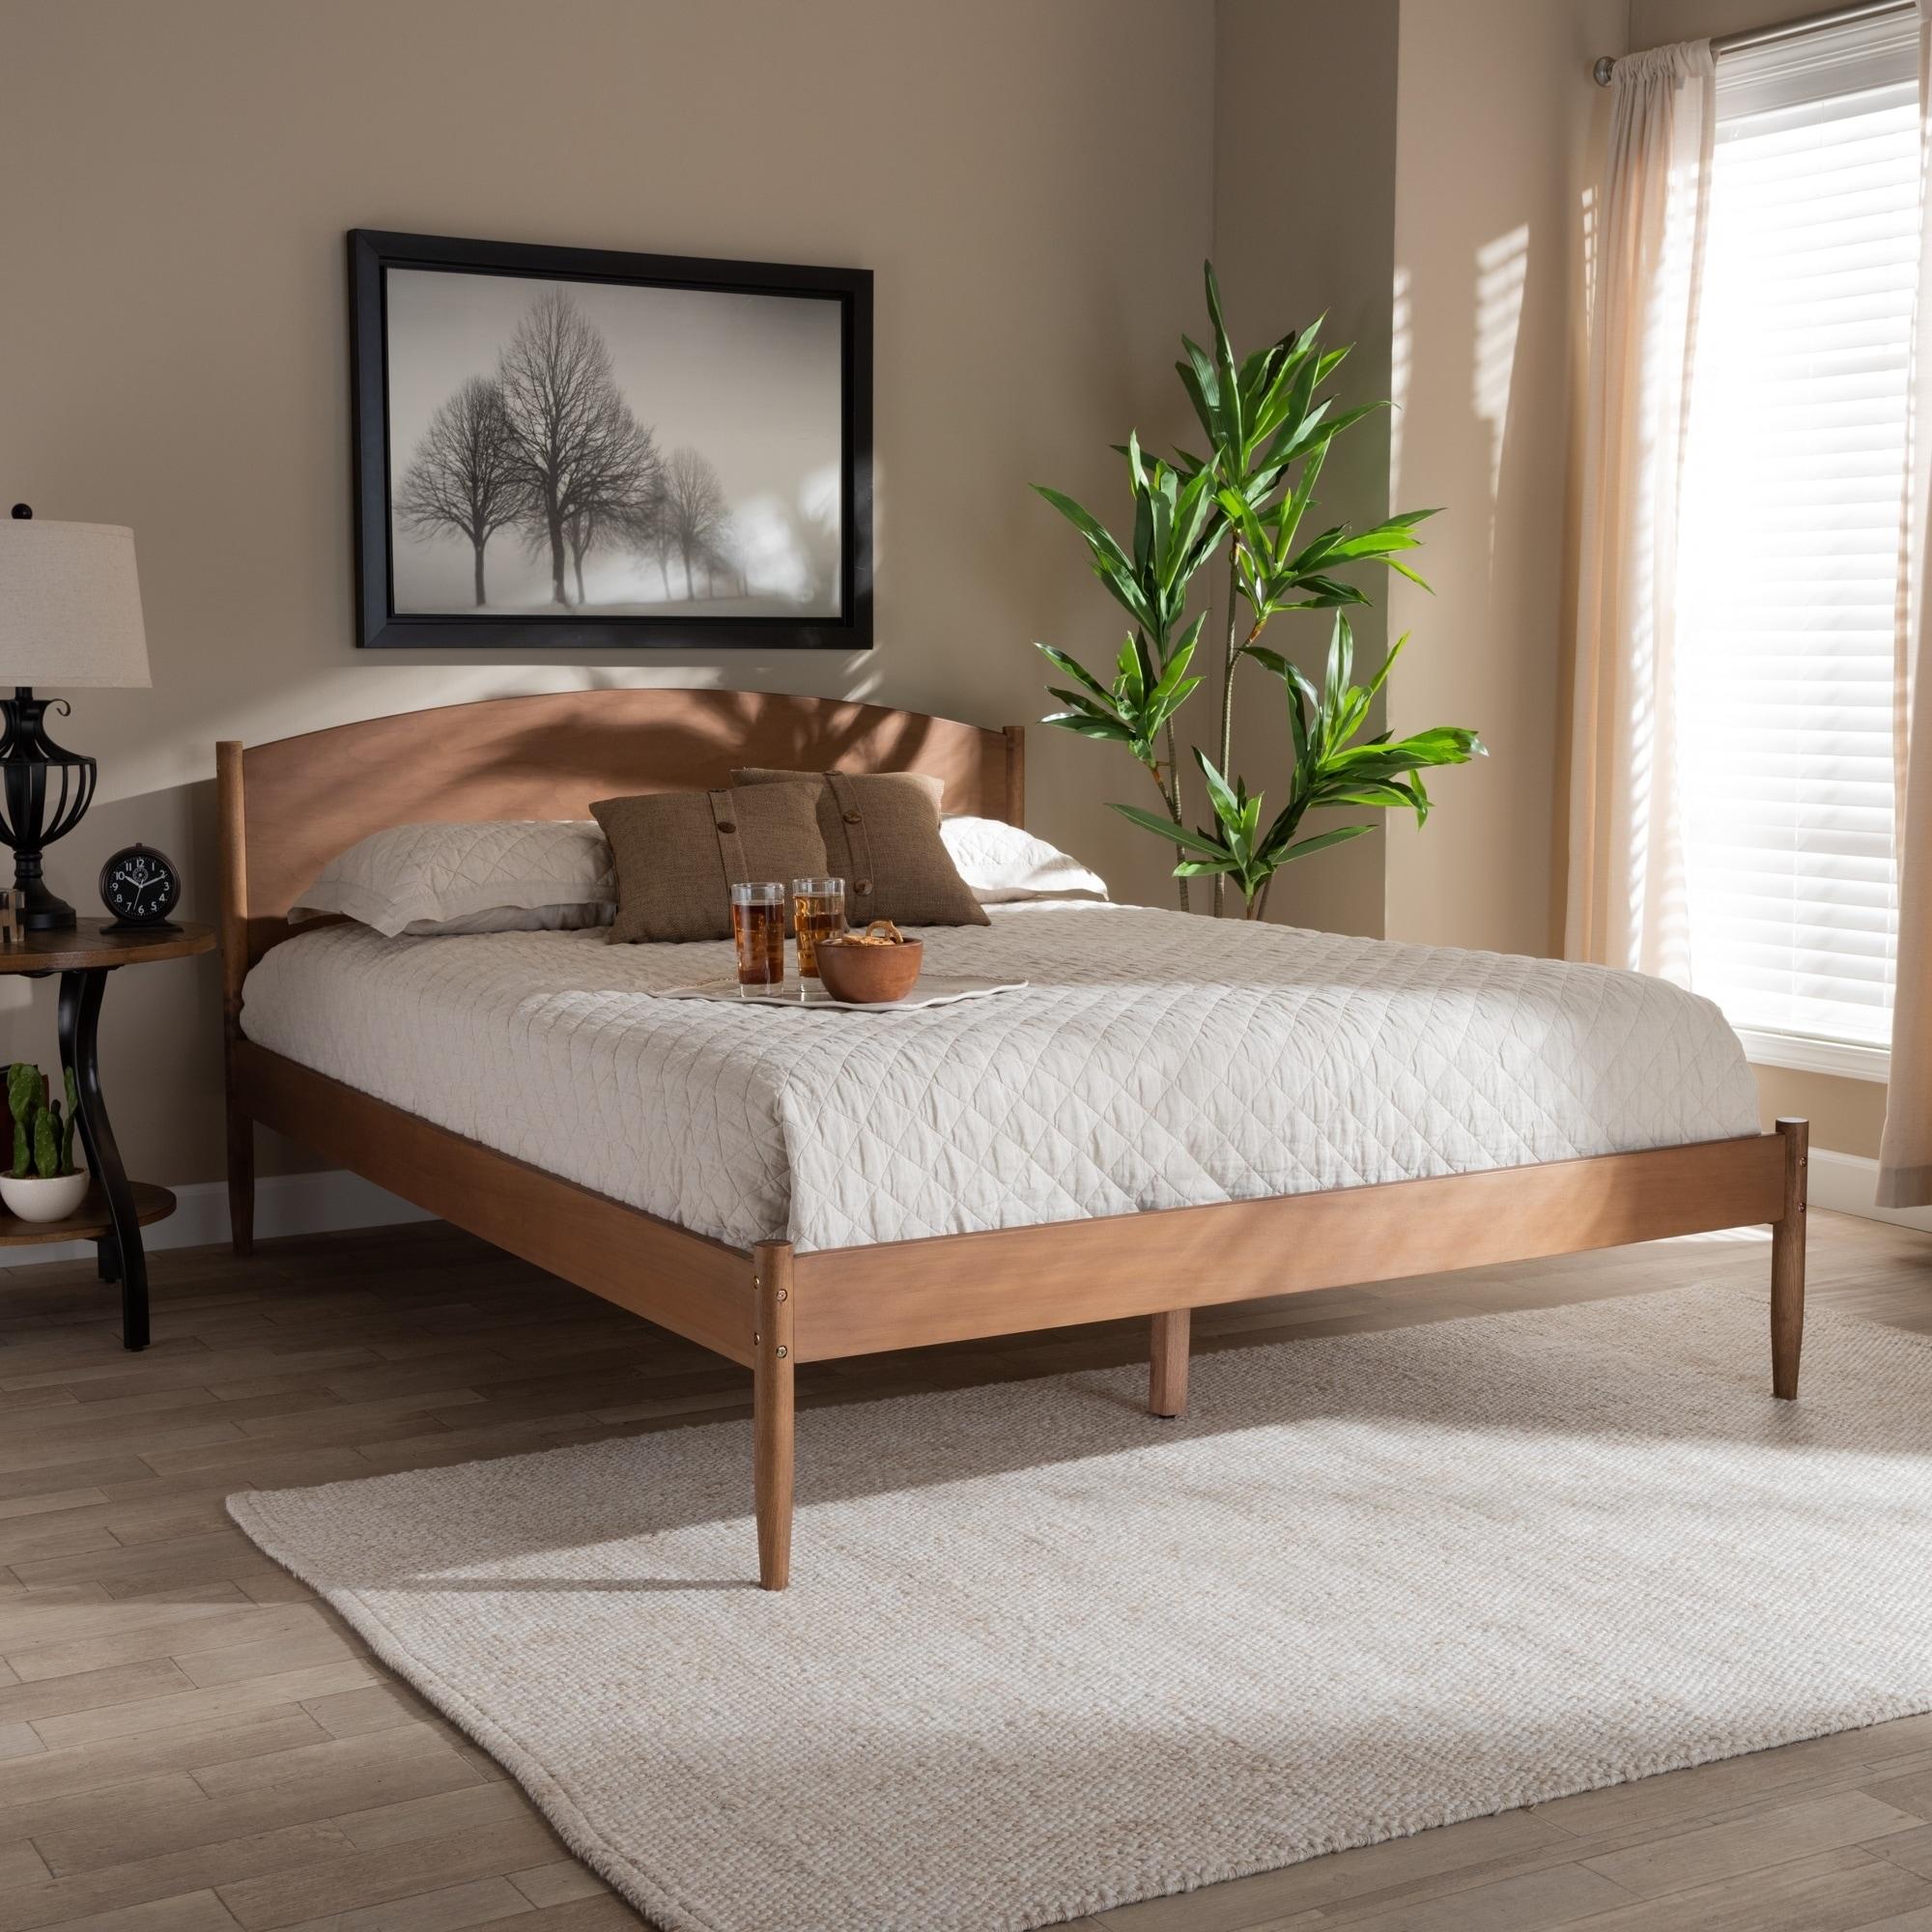 Gold Glass Dining Table, Shop Black Friday Deals On Carson Carrington Taftarod Mid Century Modern Wood Platform Bed Overstock 29095185